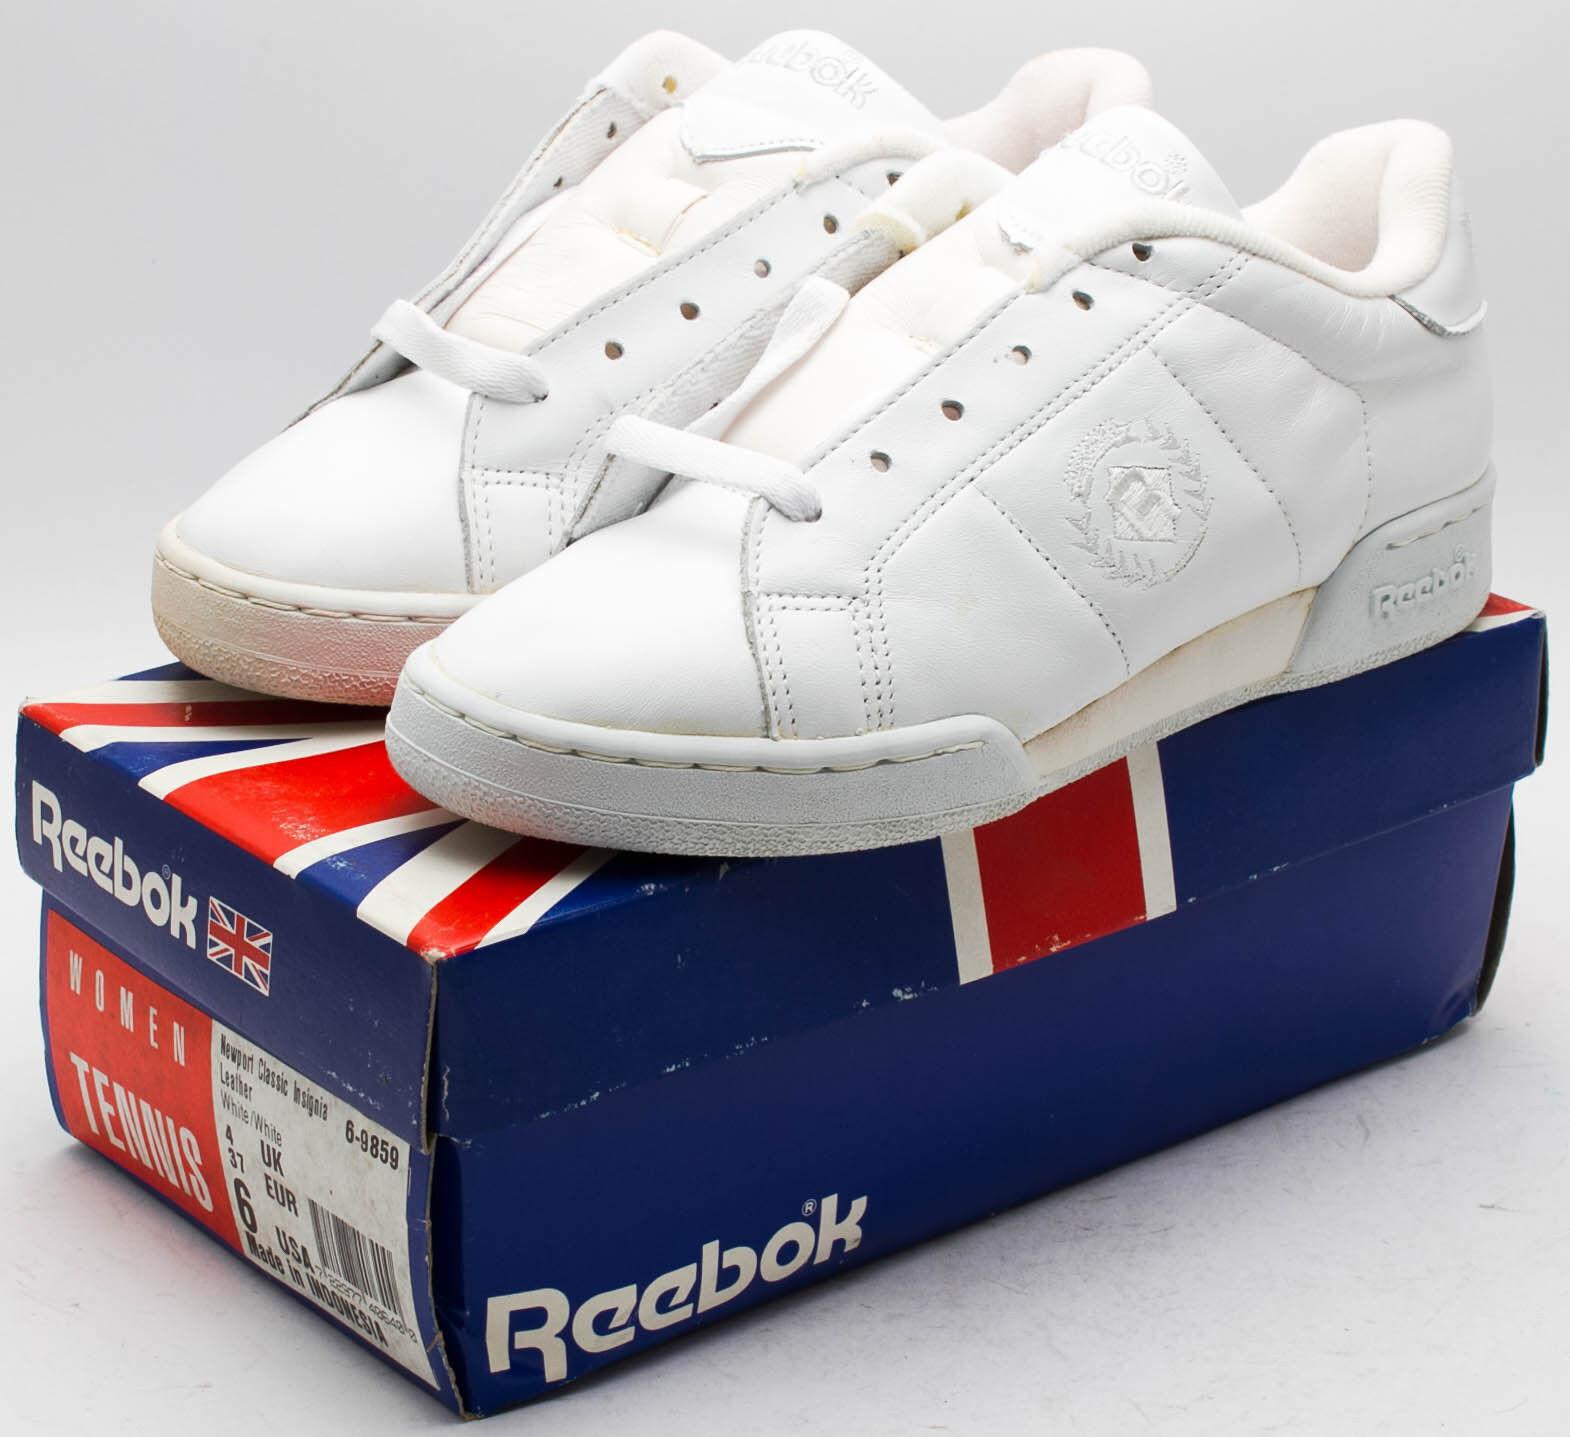 Reebok Women's Vintage 1991 Newport Newport Newport Classic Insignia Leather 6-9859 White sz. 6 b4adce